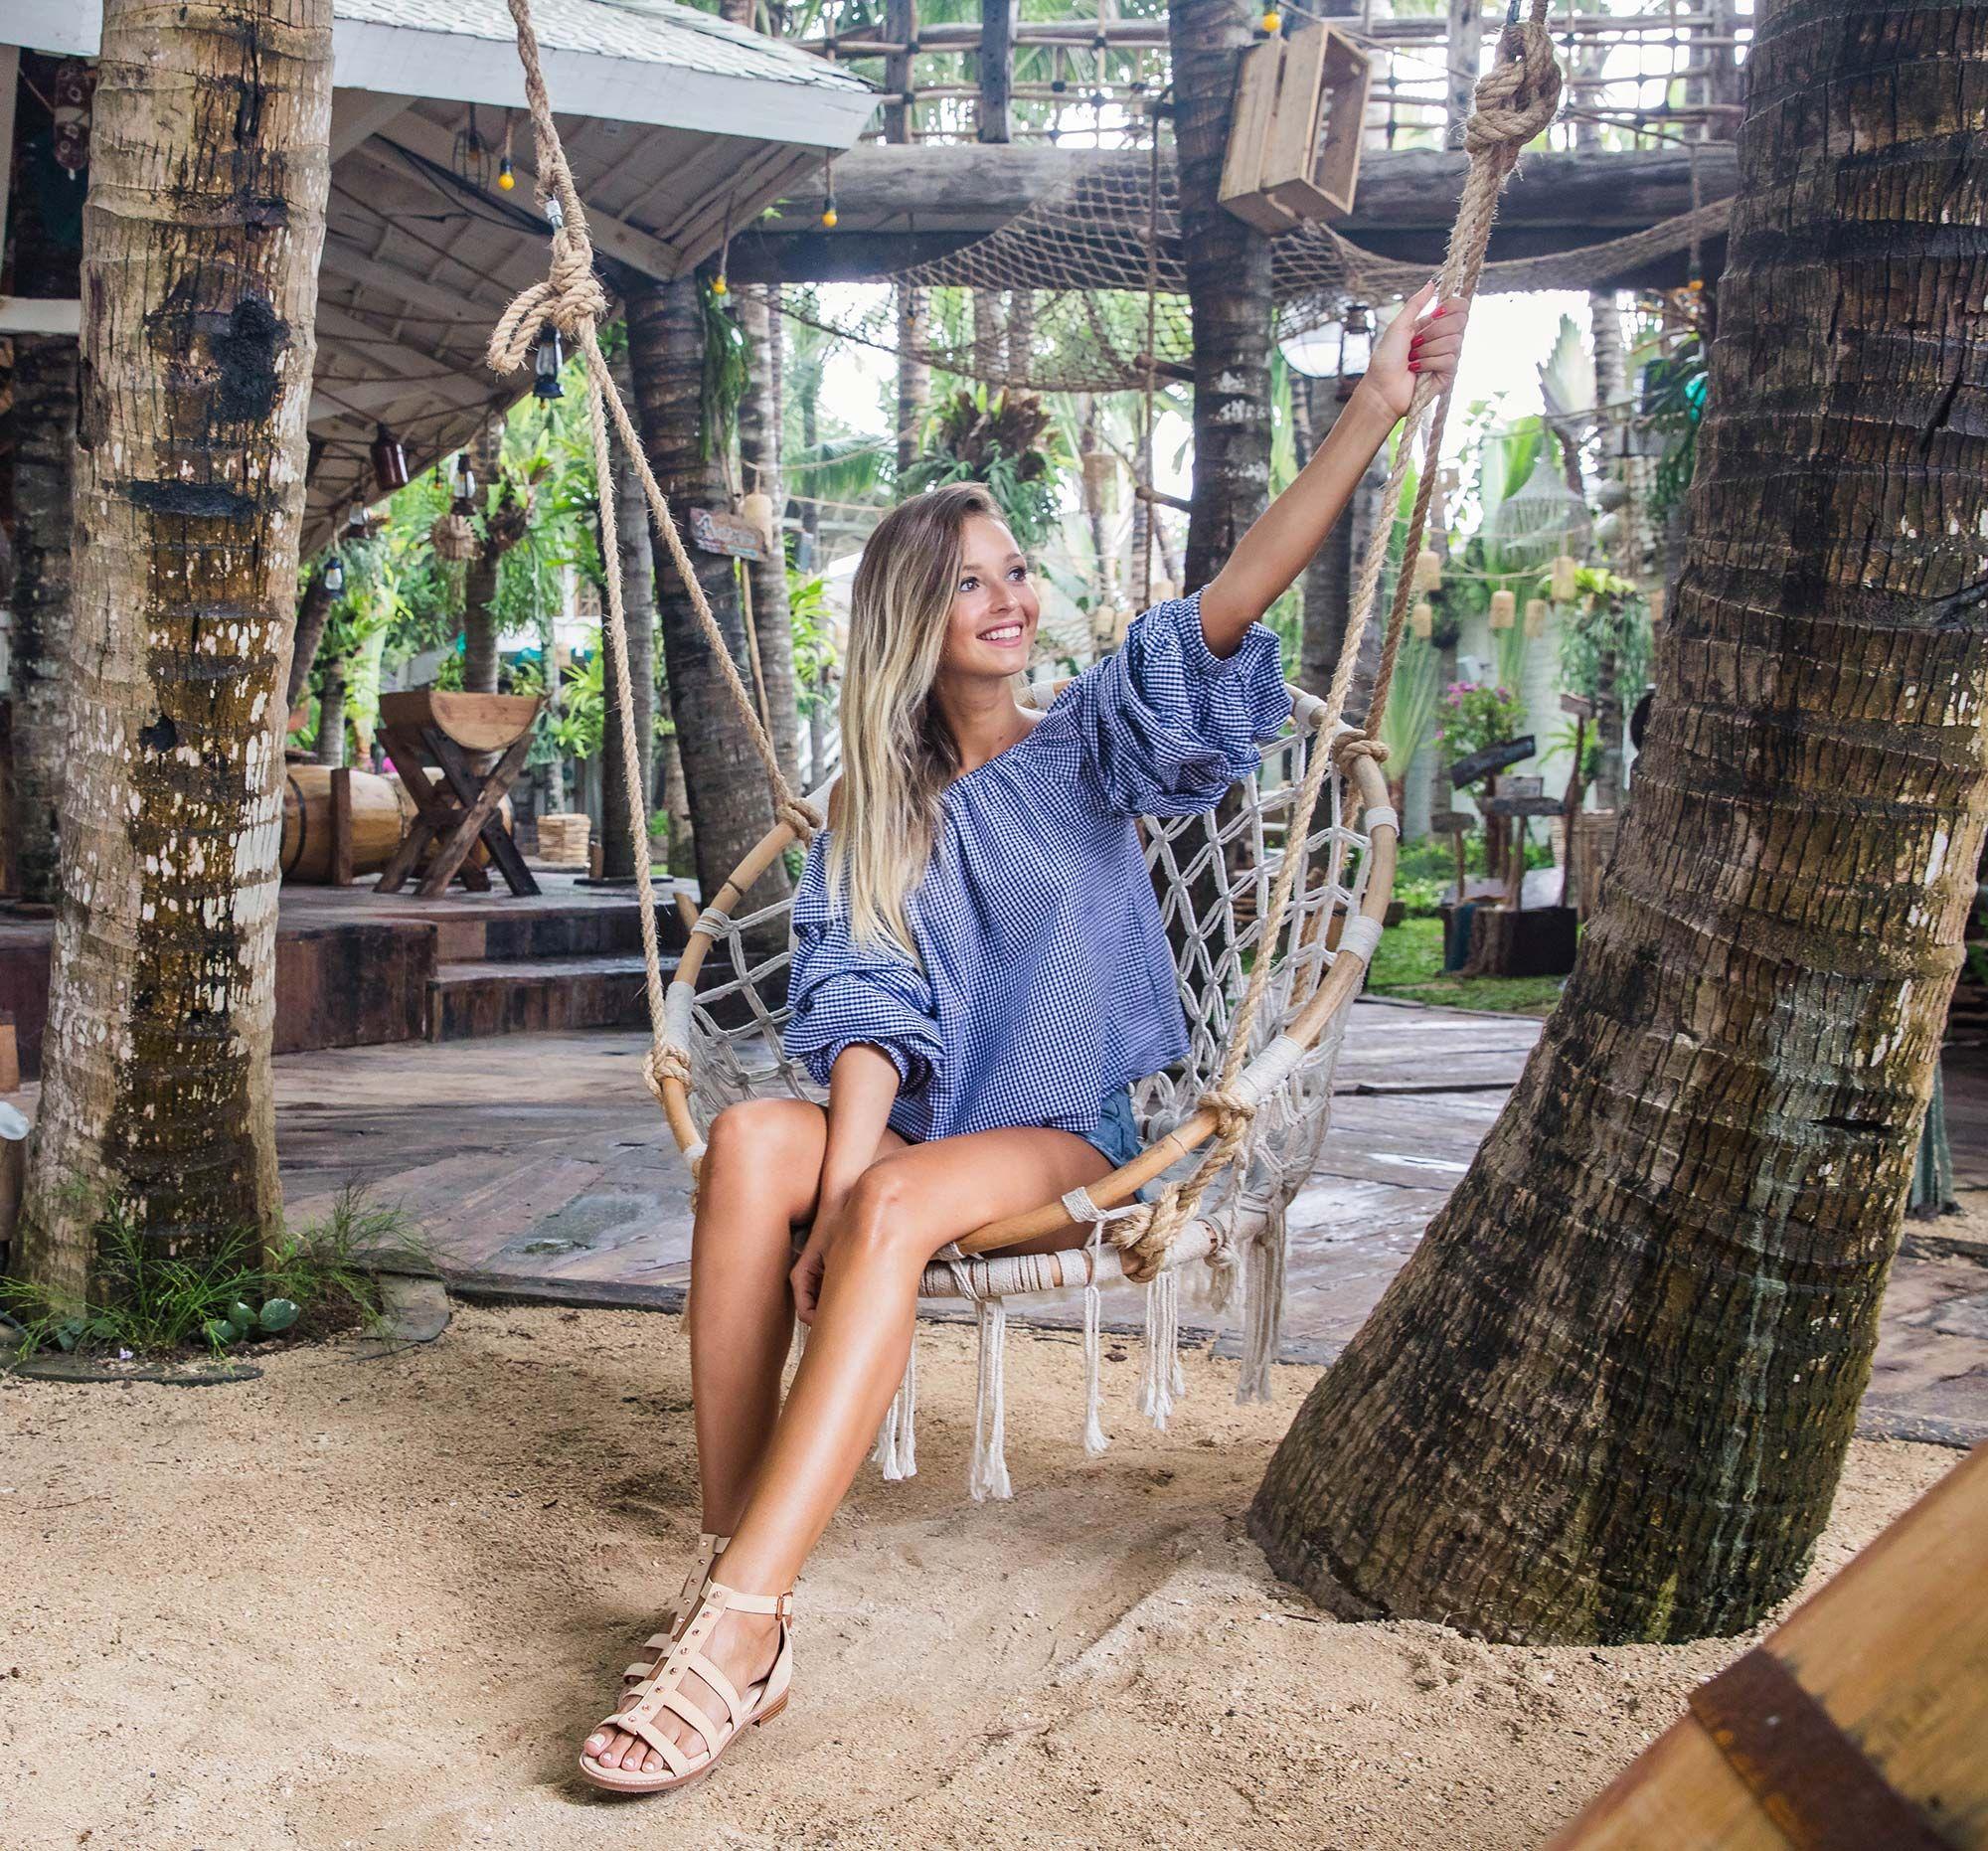 Bared_Footwear_La_Brisa_Bali_Travel_Summer_Womens_Campaign_Tinamou_Light_Tan_Sandals